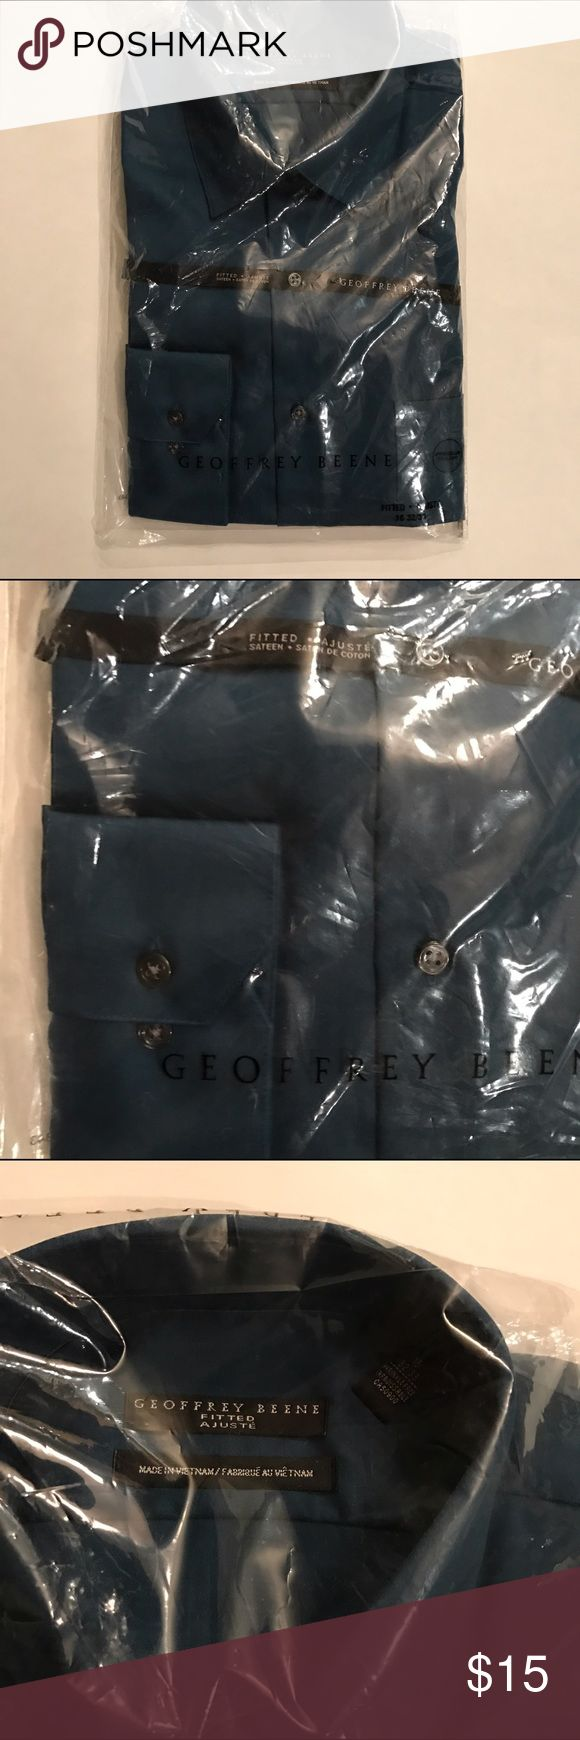 NWT BUTTON DOWN SHIRT BRAND NEW Geoffrey Beene shirt Geoffrey Beene Shirts Dress Shirts